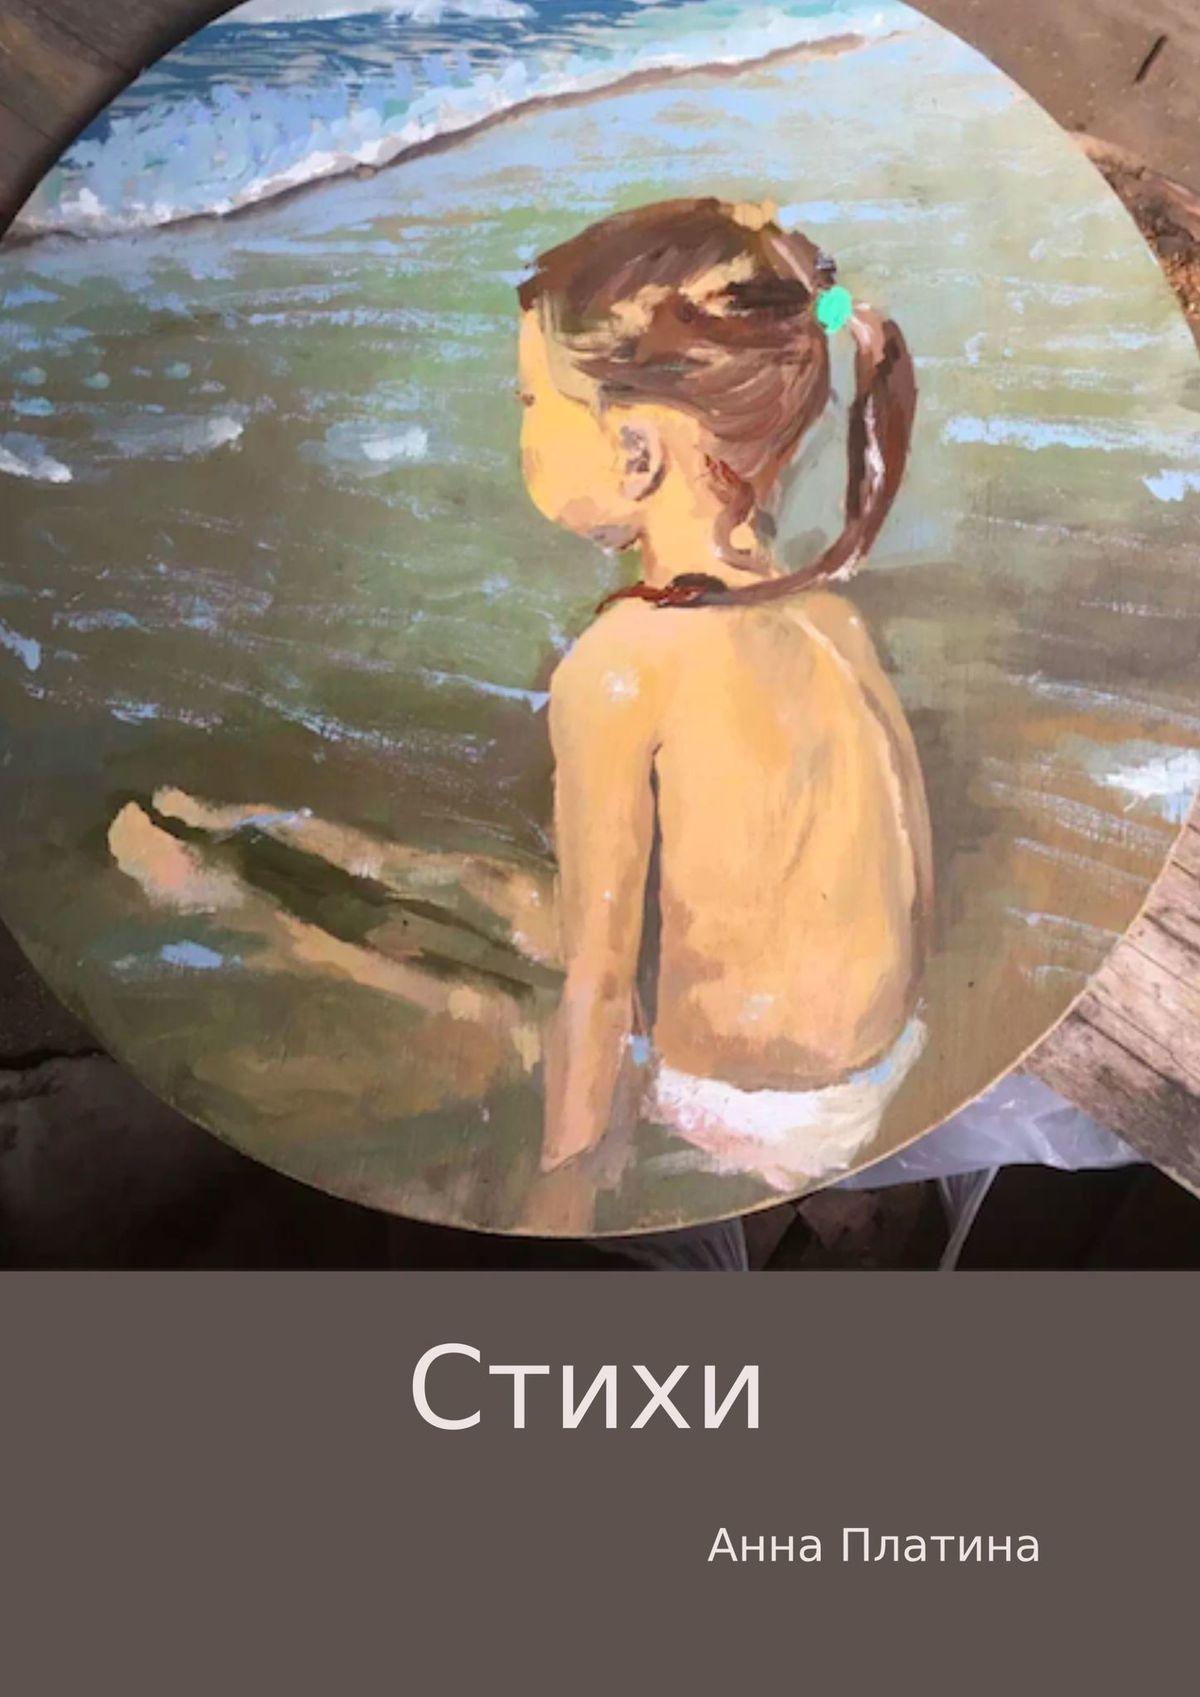 Анна Платина Стихи анна александровна голошивец пробы пера сборник стихов